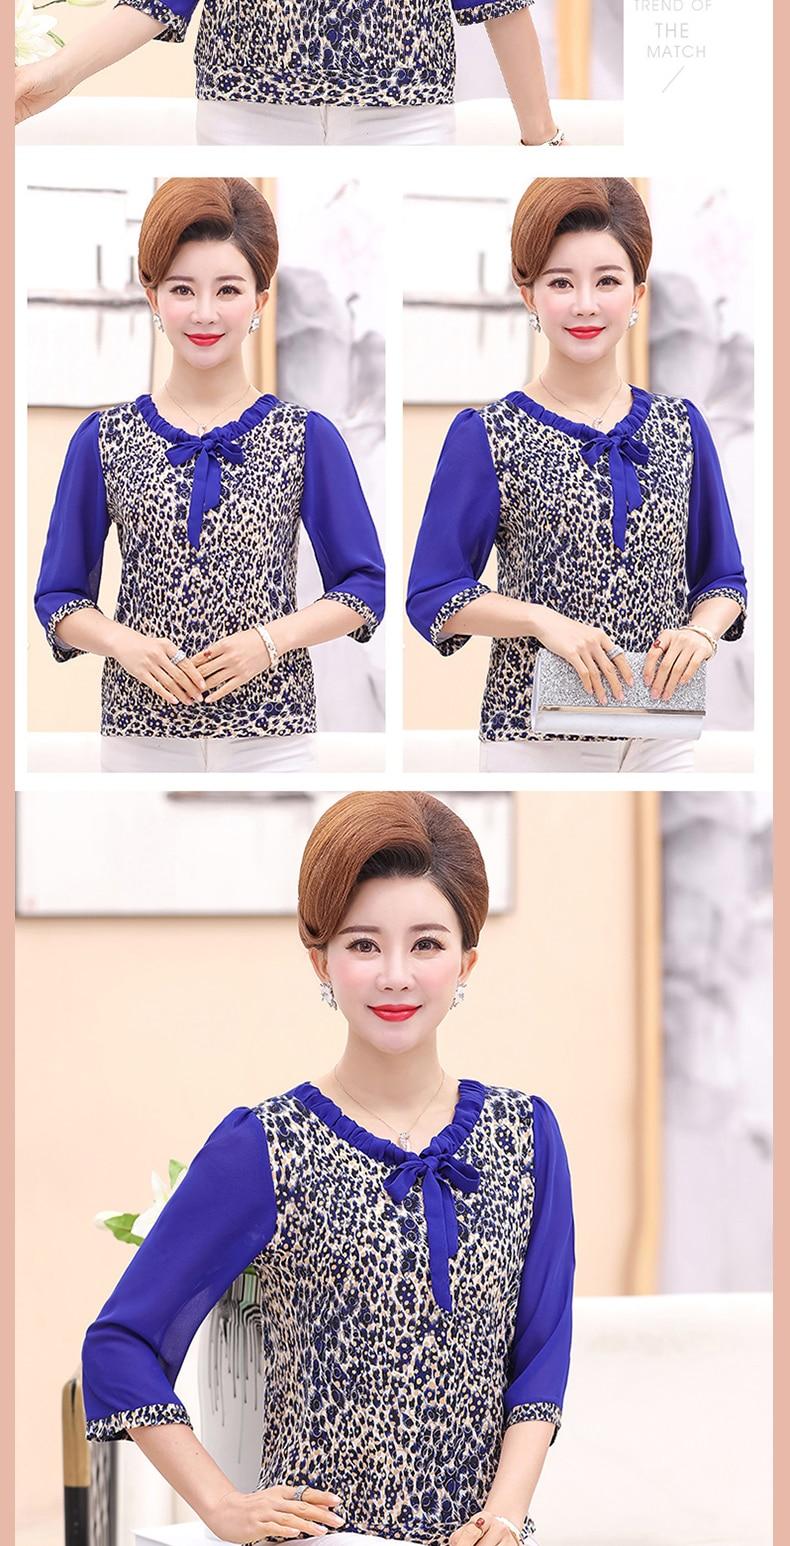 Women Summer Blouses Khaki Blue Leopard Print Crepe Tops Female Short Sleeve Bowknot Round Collar Tunic Woman Casual Blouse Shirt (13)